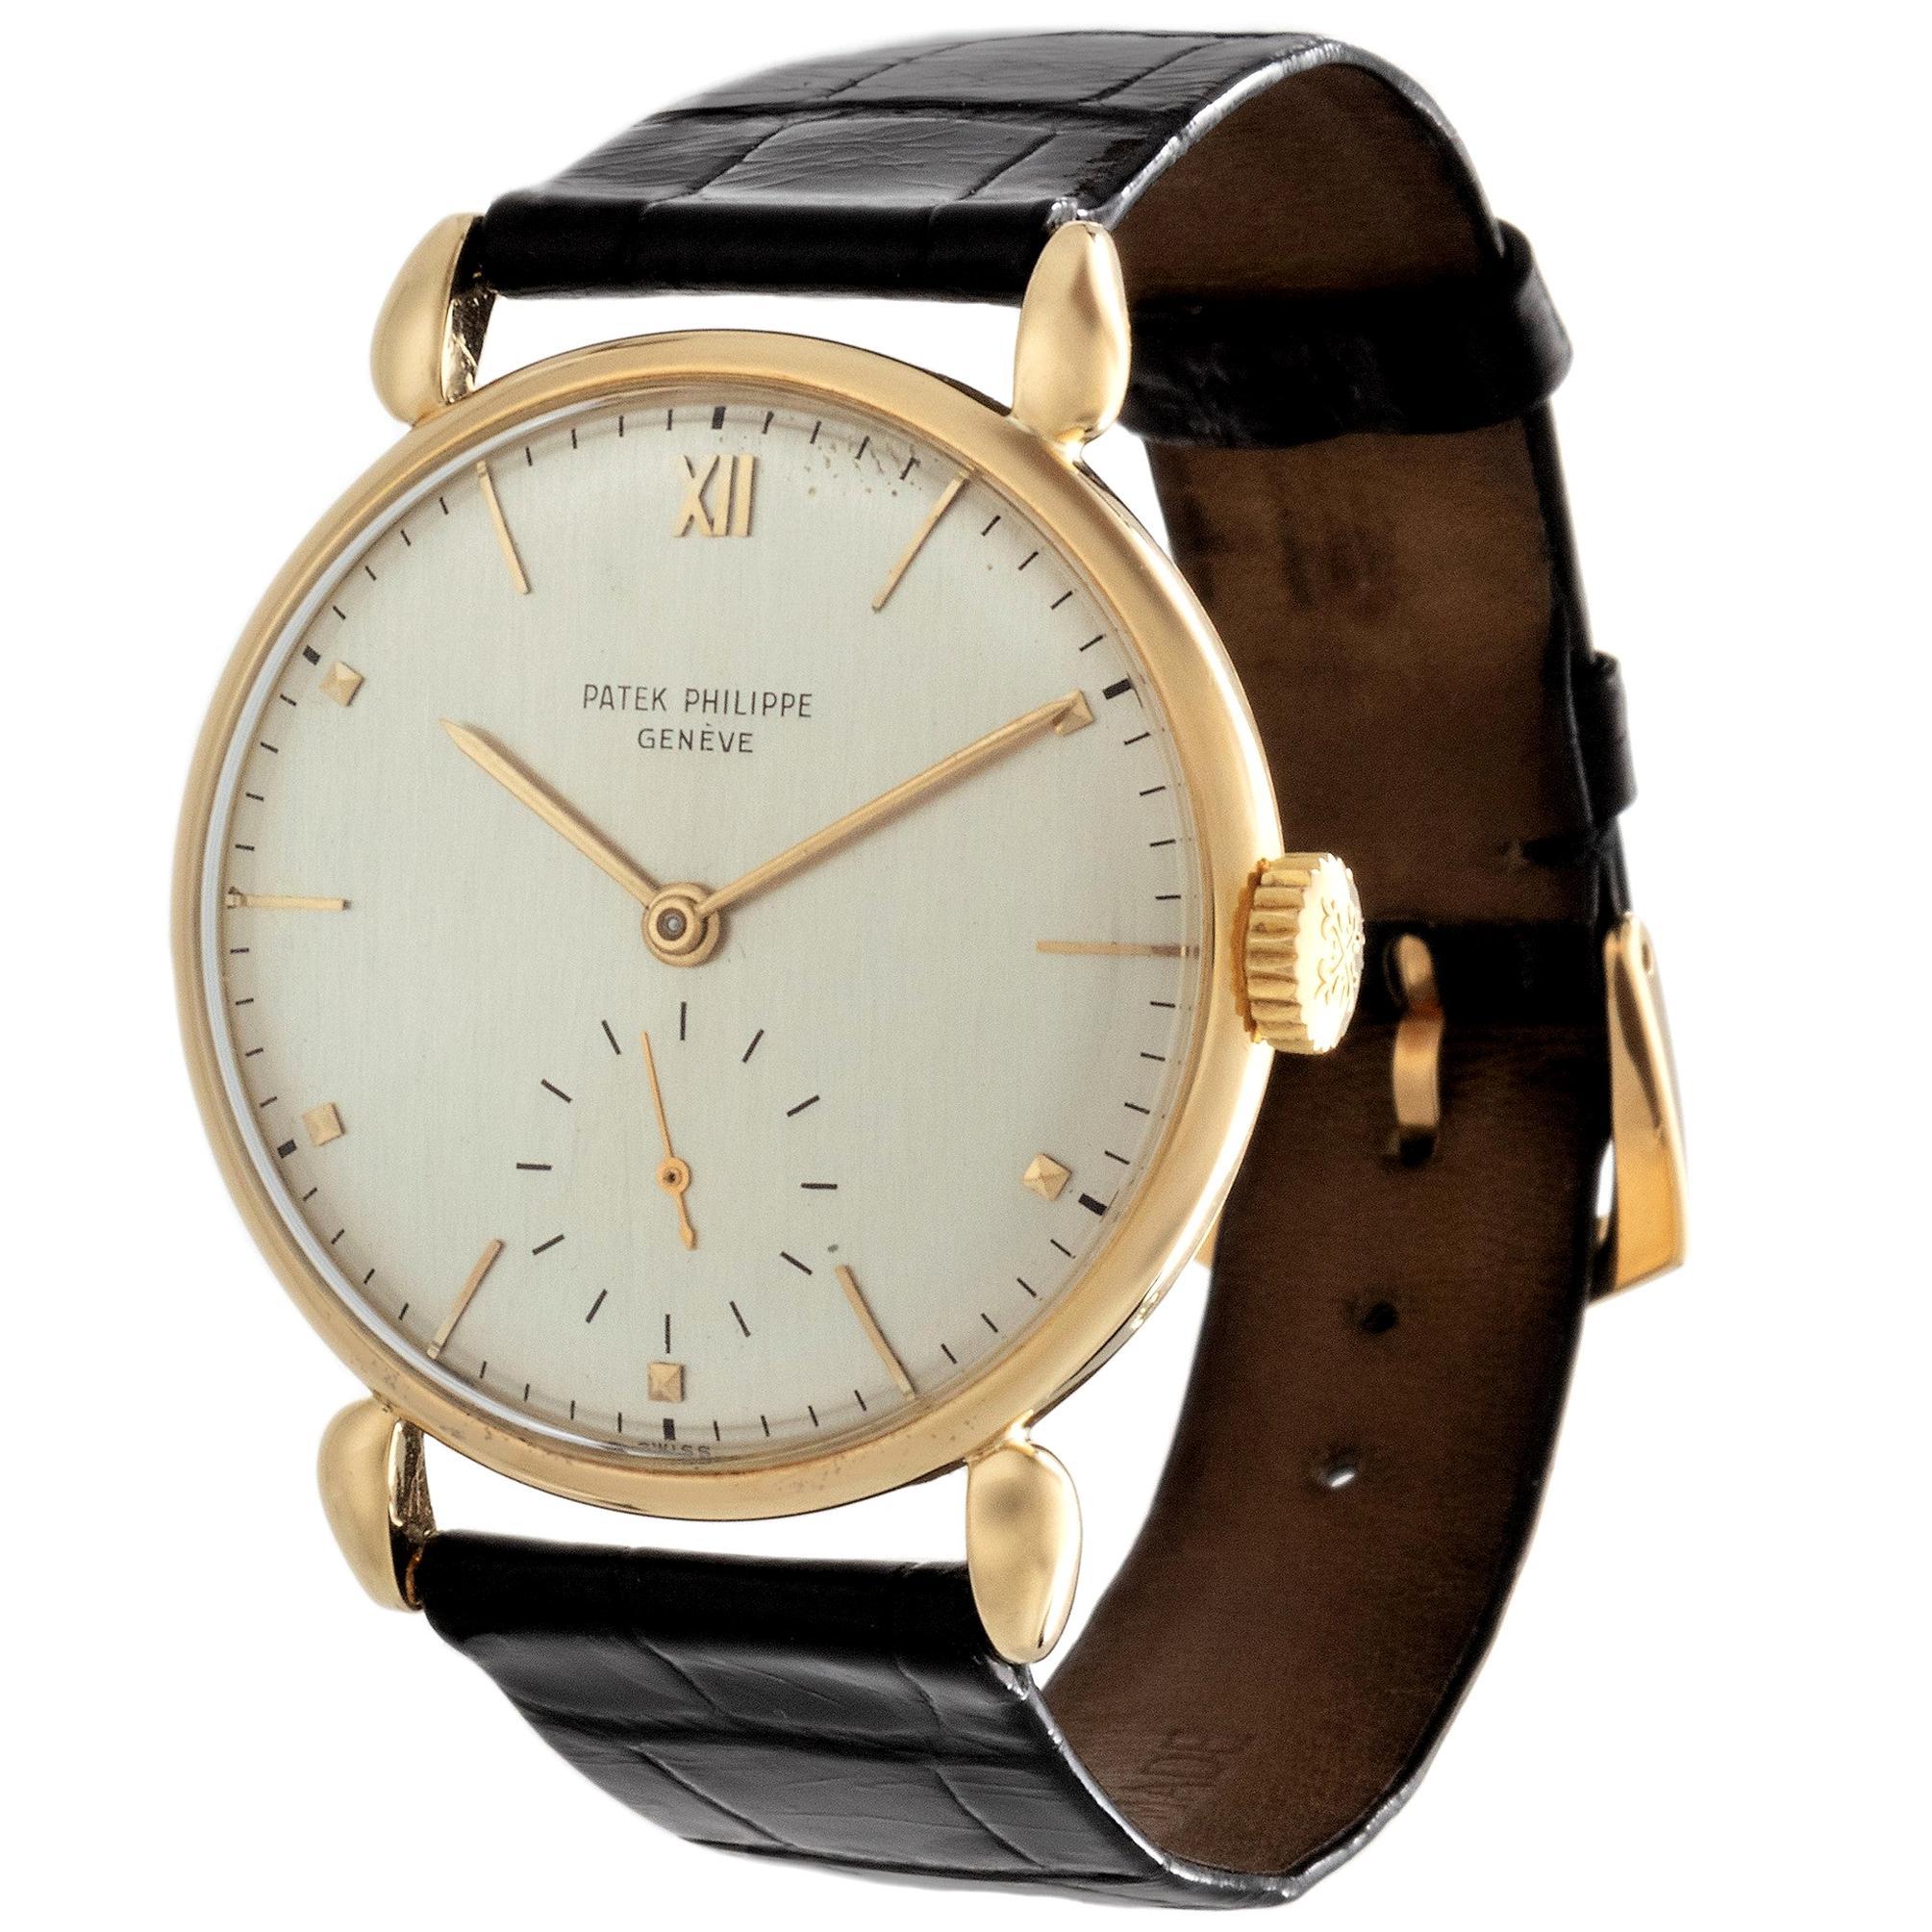 Patek Philippe 1509J Calatrava Watch